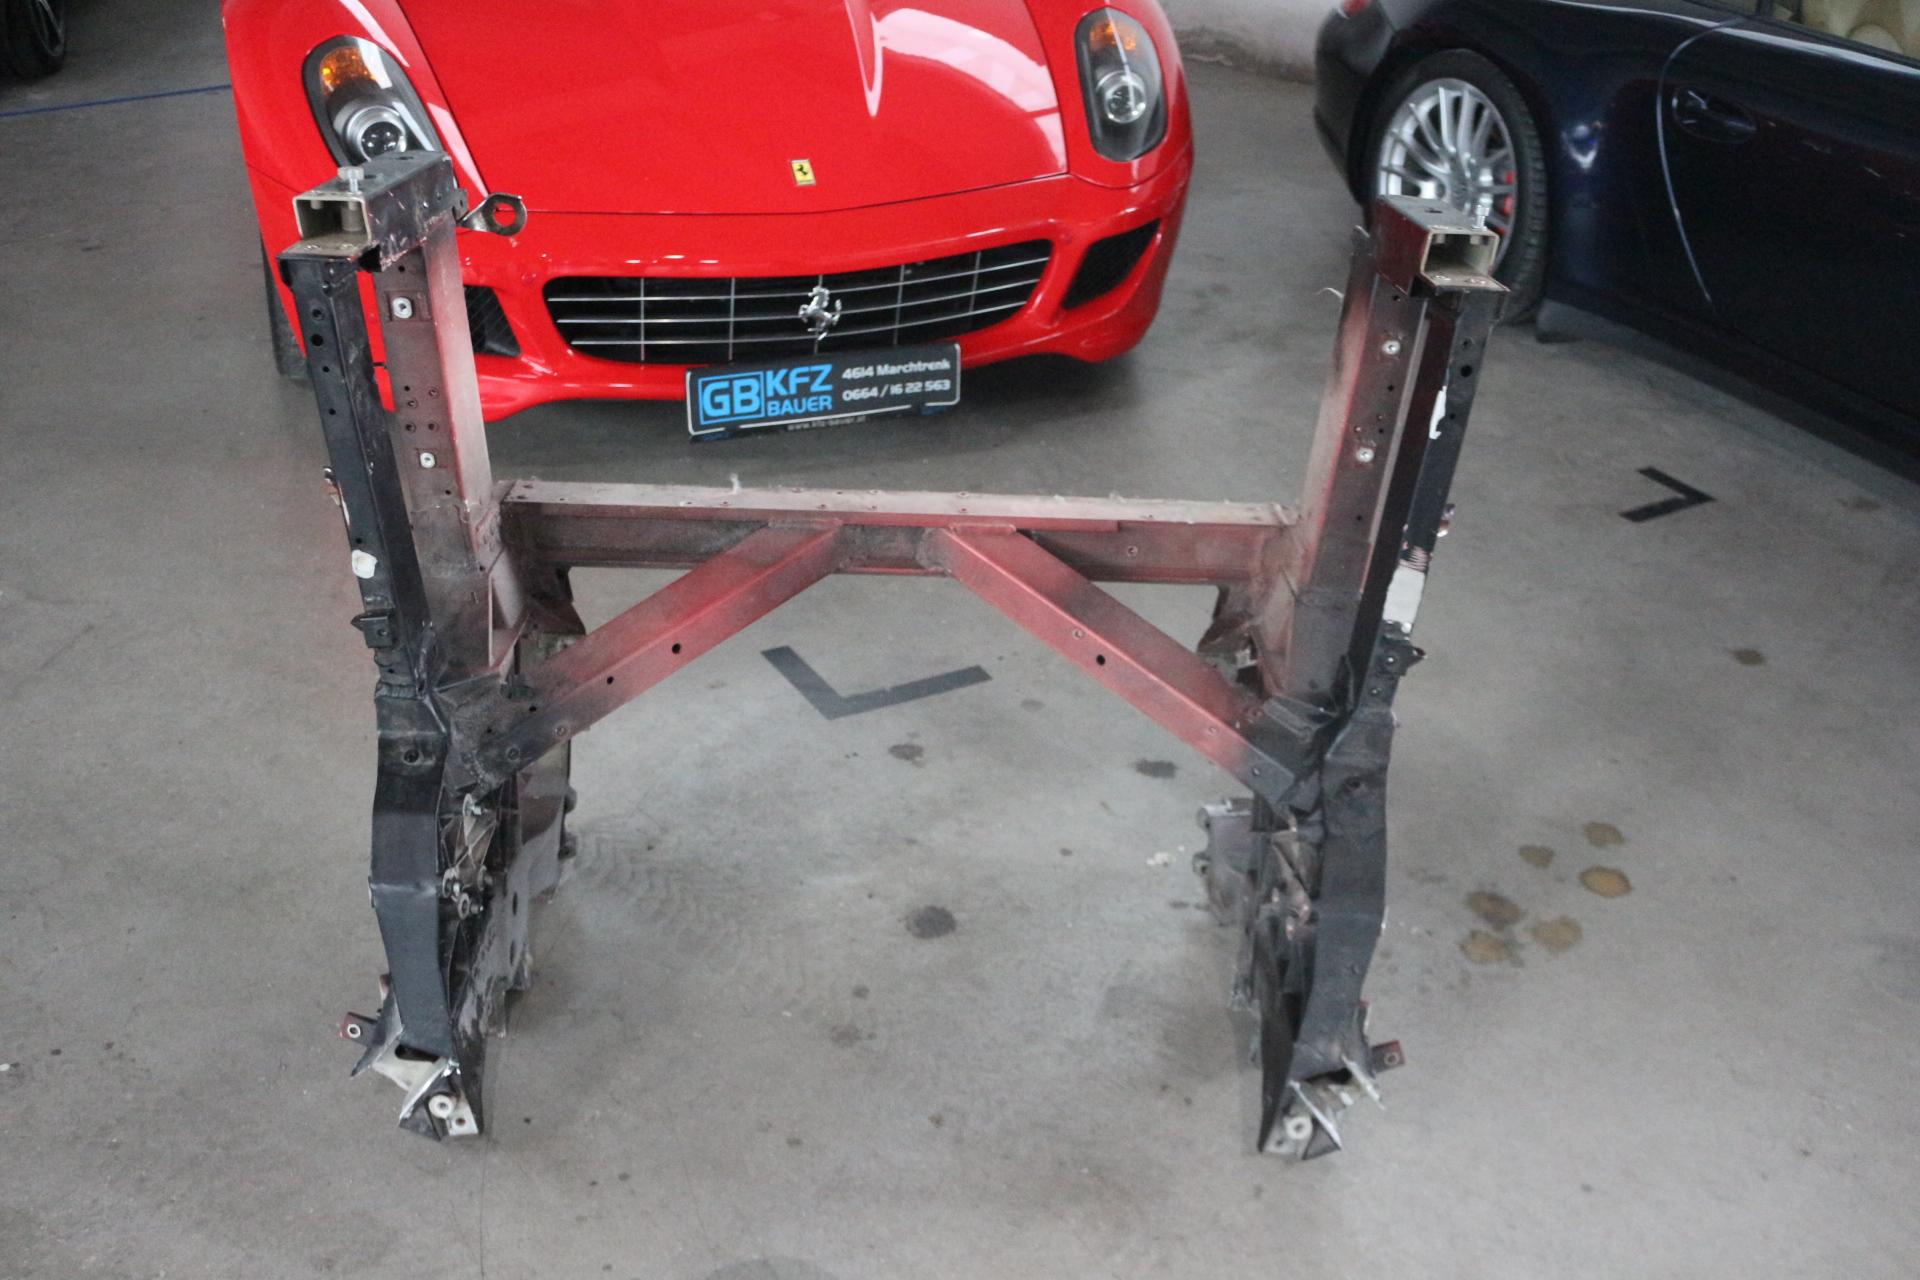 Ferrari F12 Berlinetta Heckrahmen Frame Rear 277302 289375 Ebay